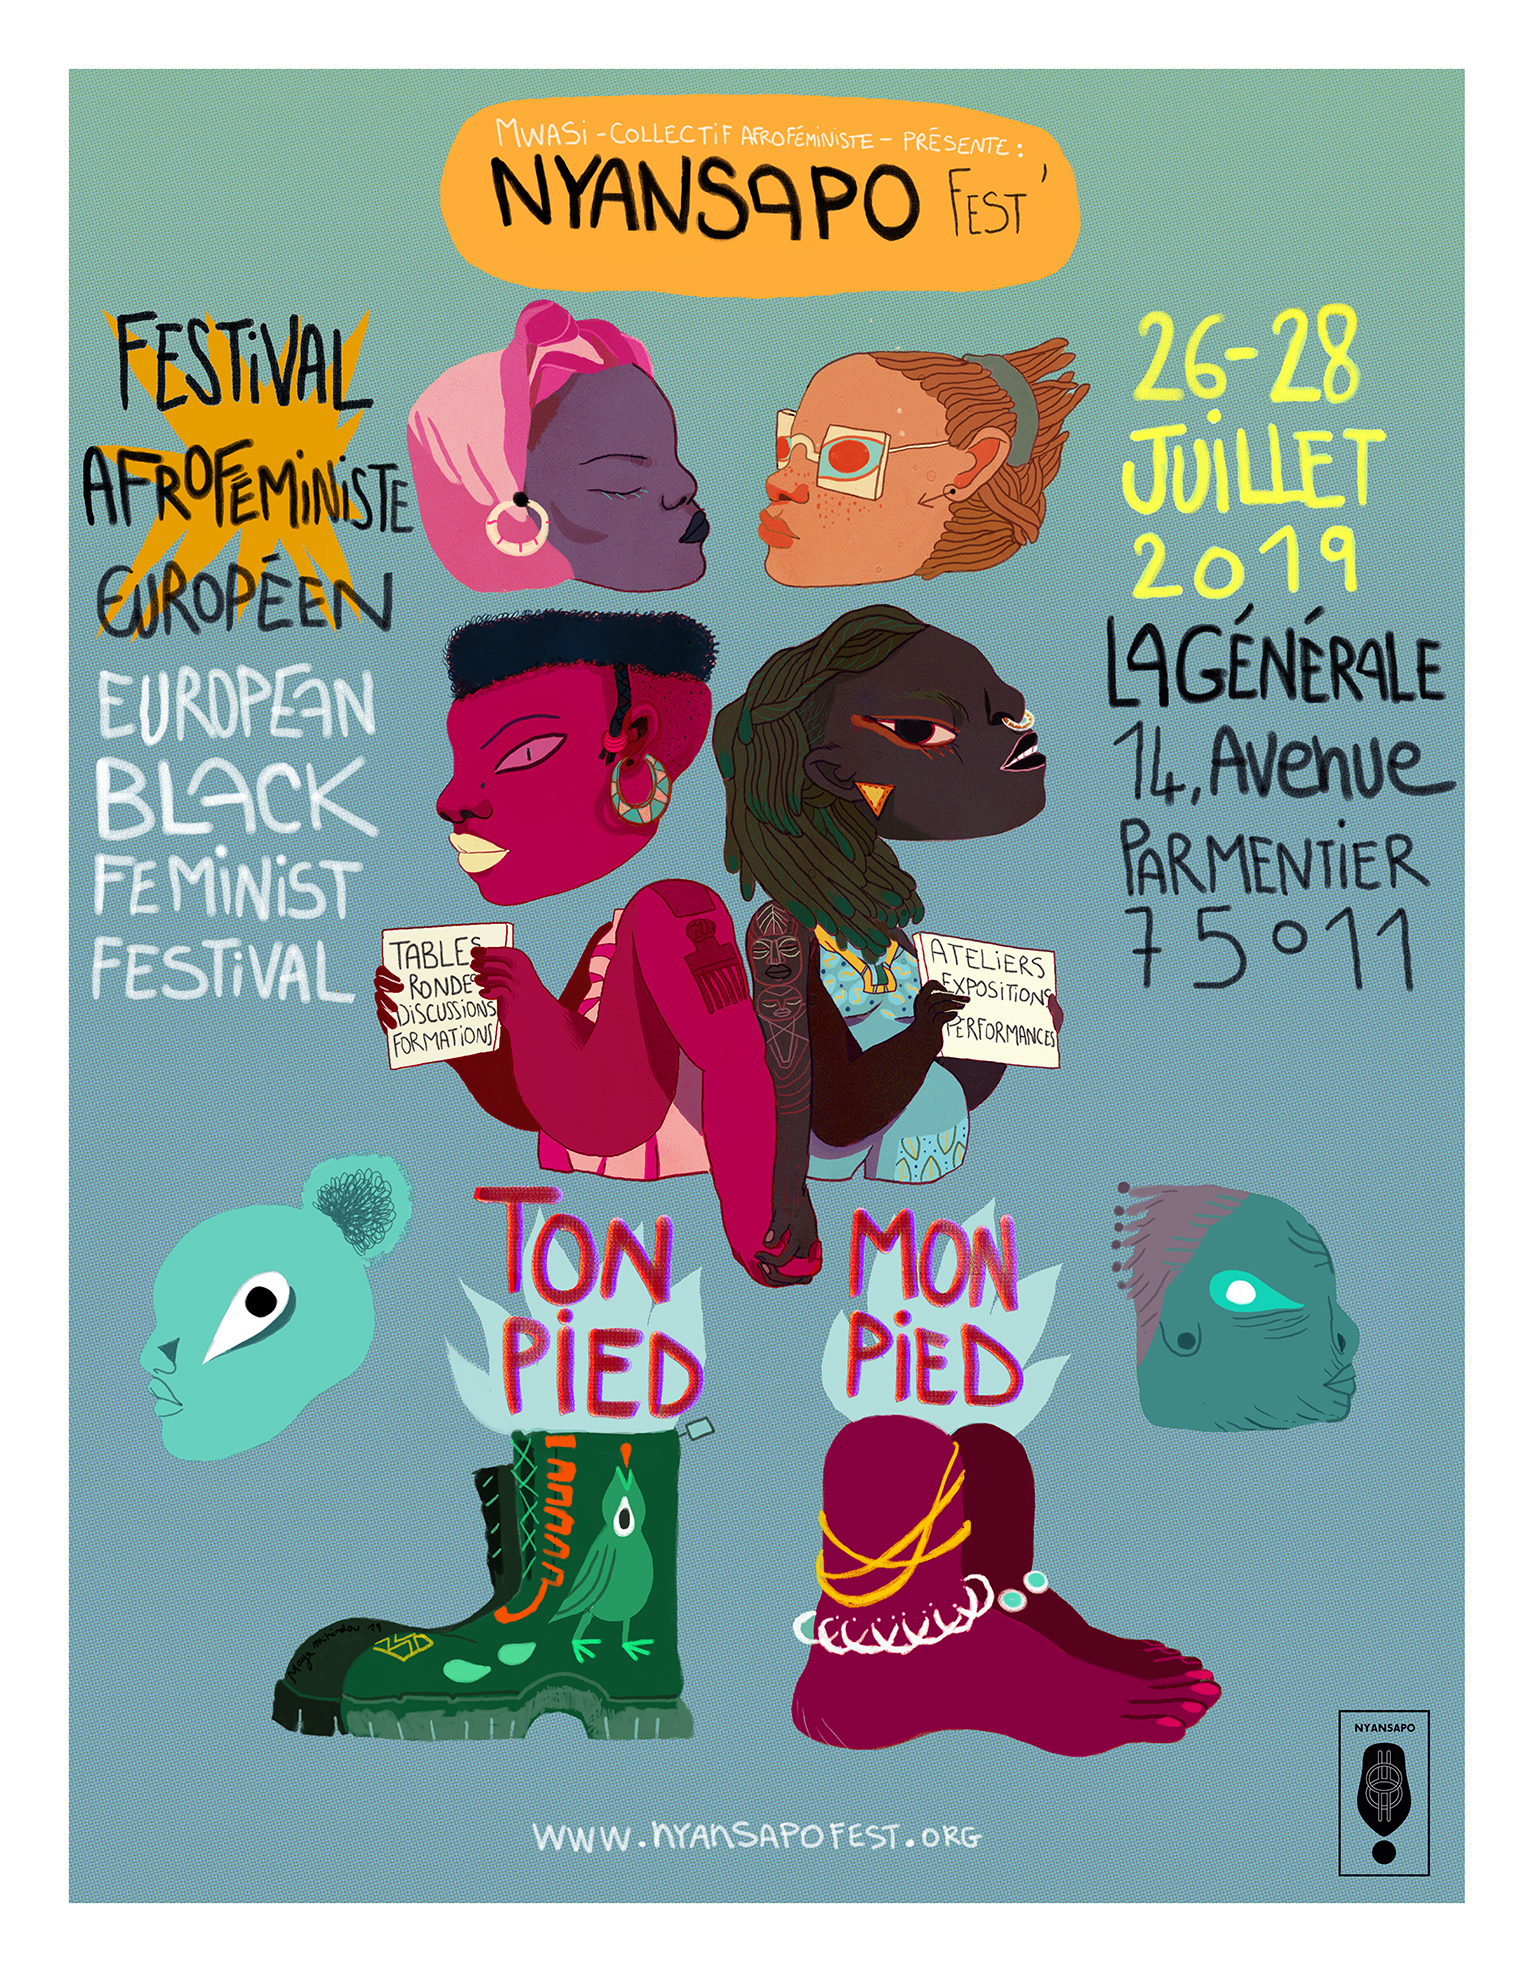 festival-nyansapo-web.jpg